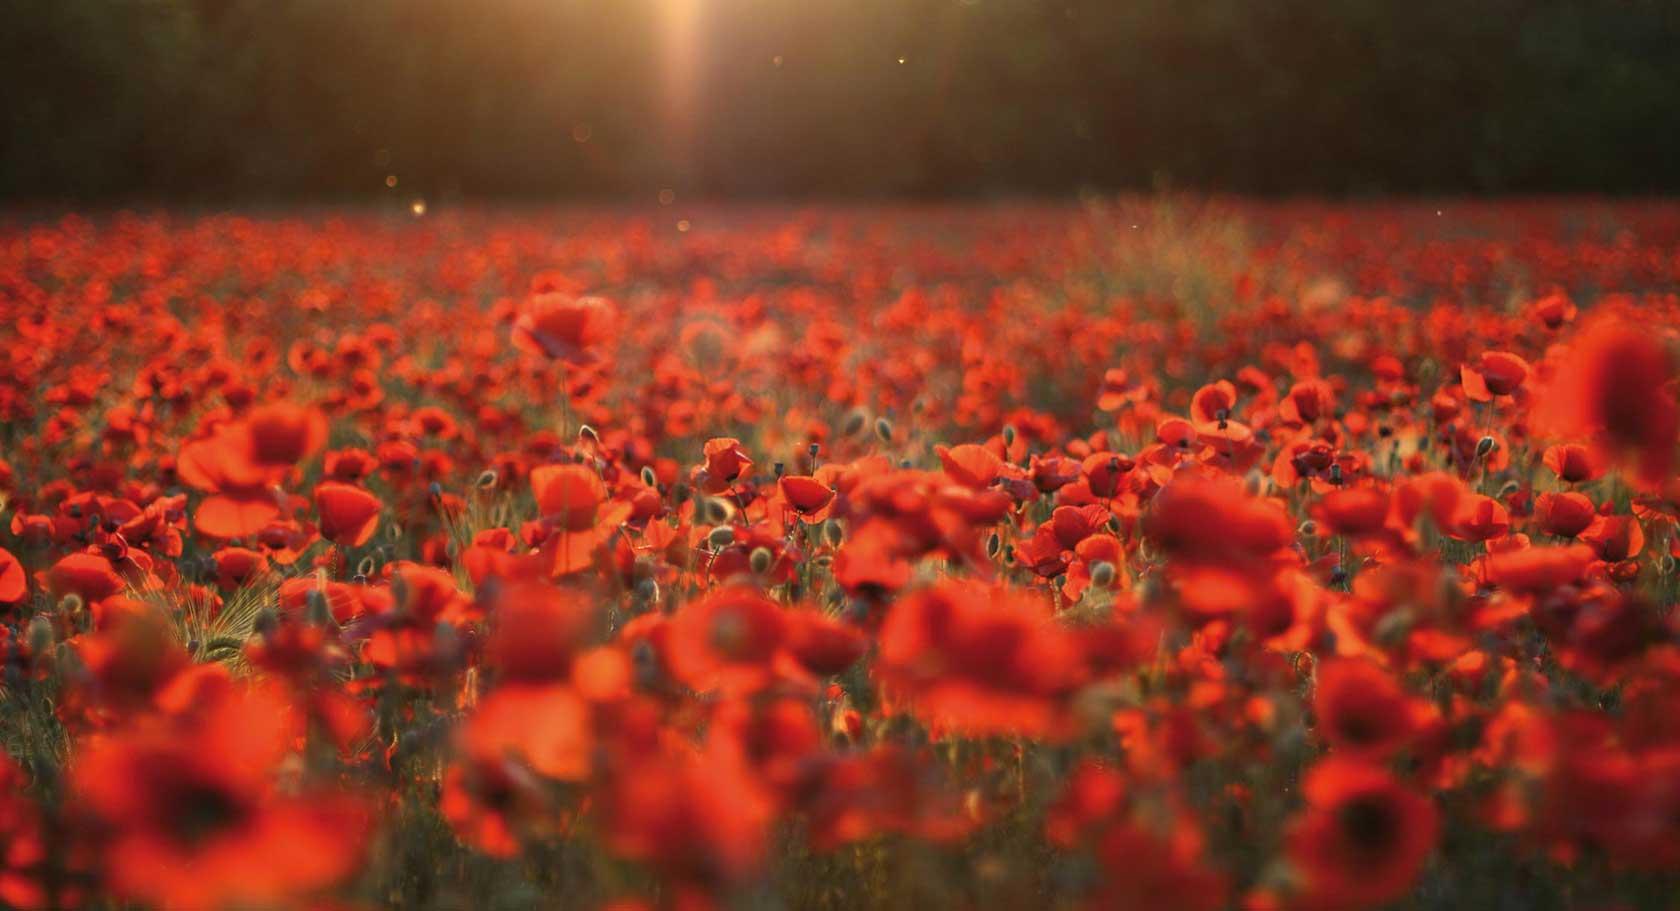 rememberance day - photo #7